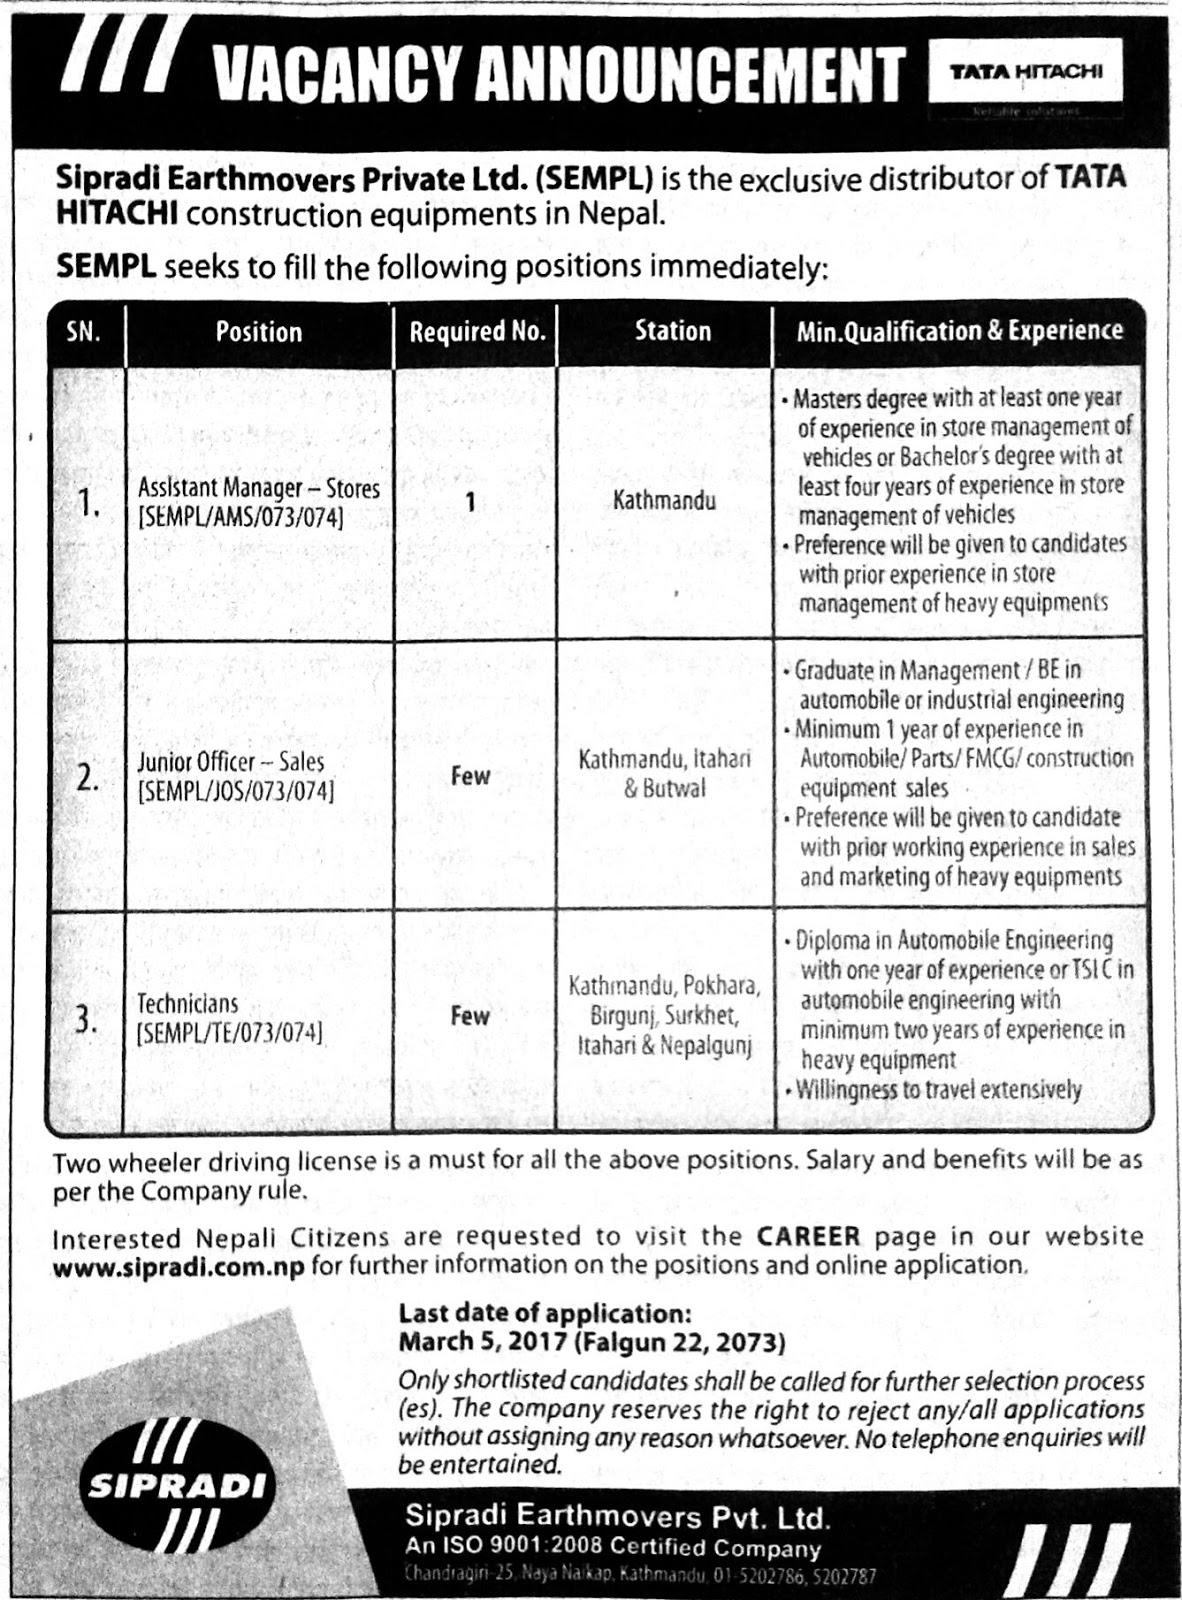 Job news in Nepal: Vacancy Announcement in Tata Hitachi Kathmandu, Nepal